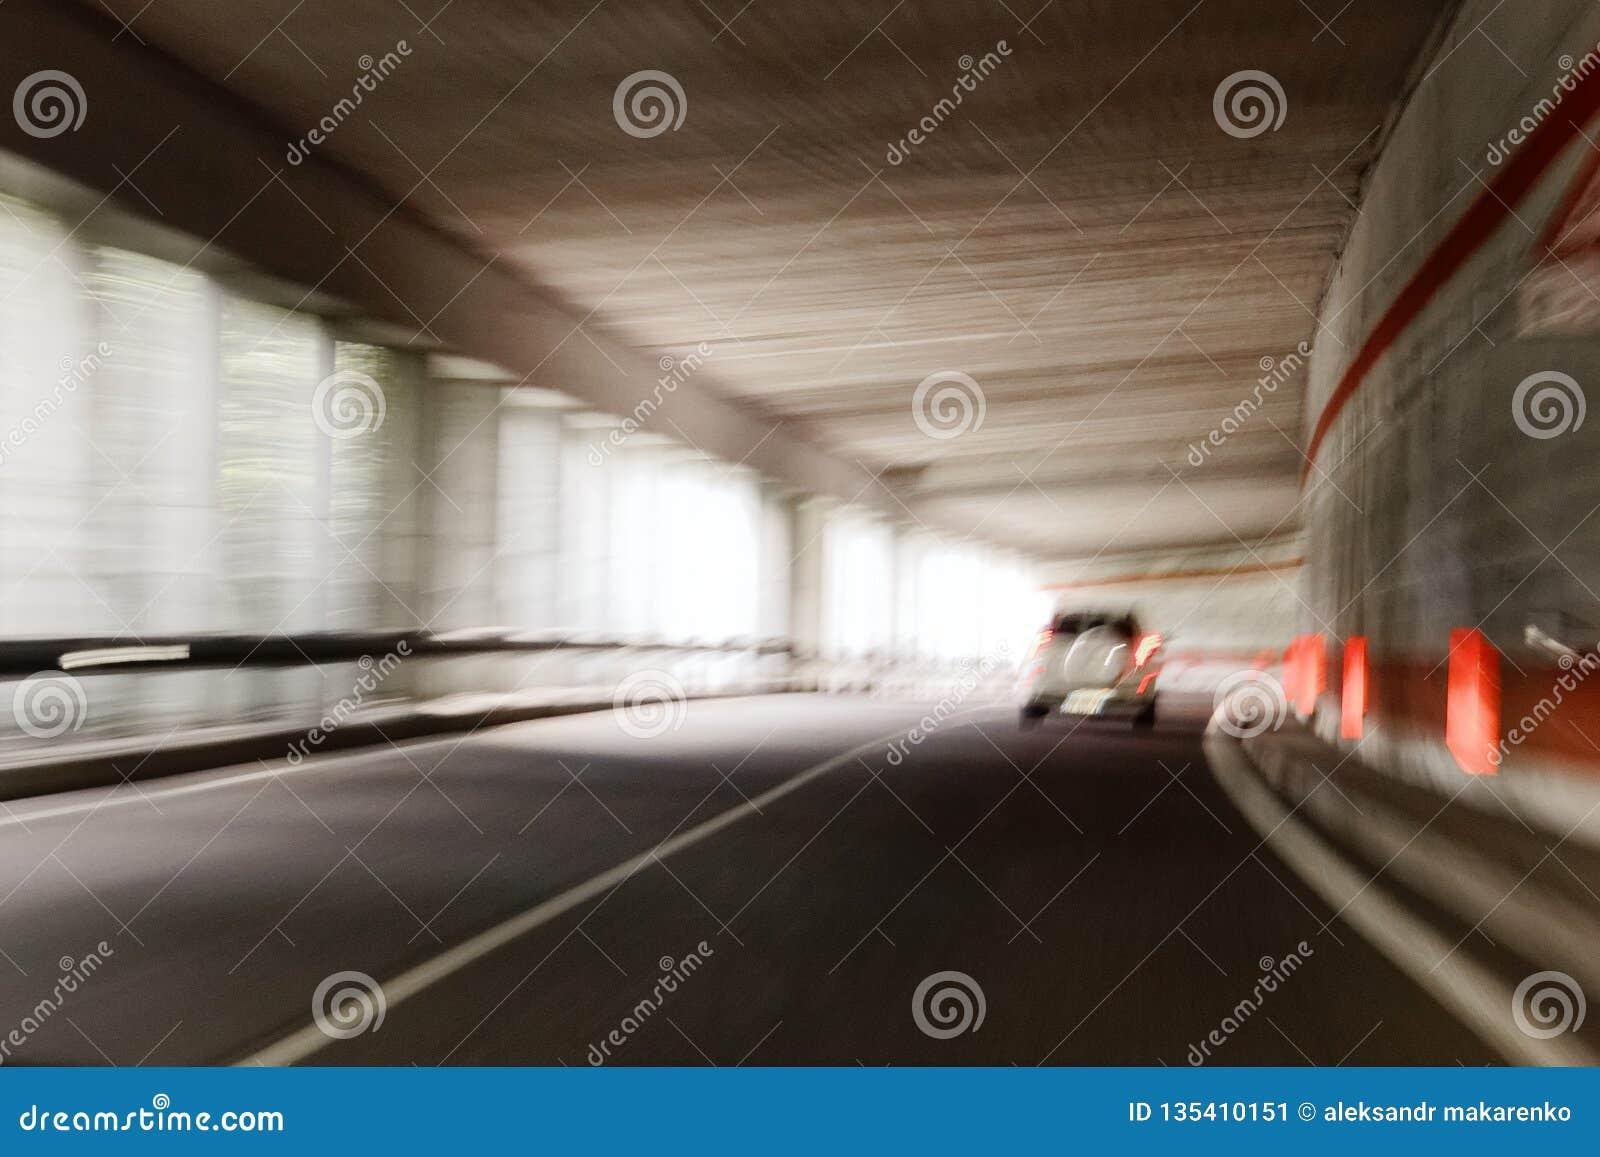 O carro está movendo-se rapidamente através do túnel borrado unsharply